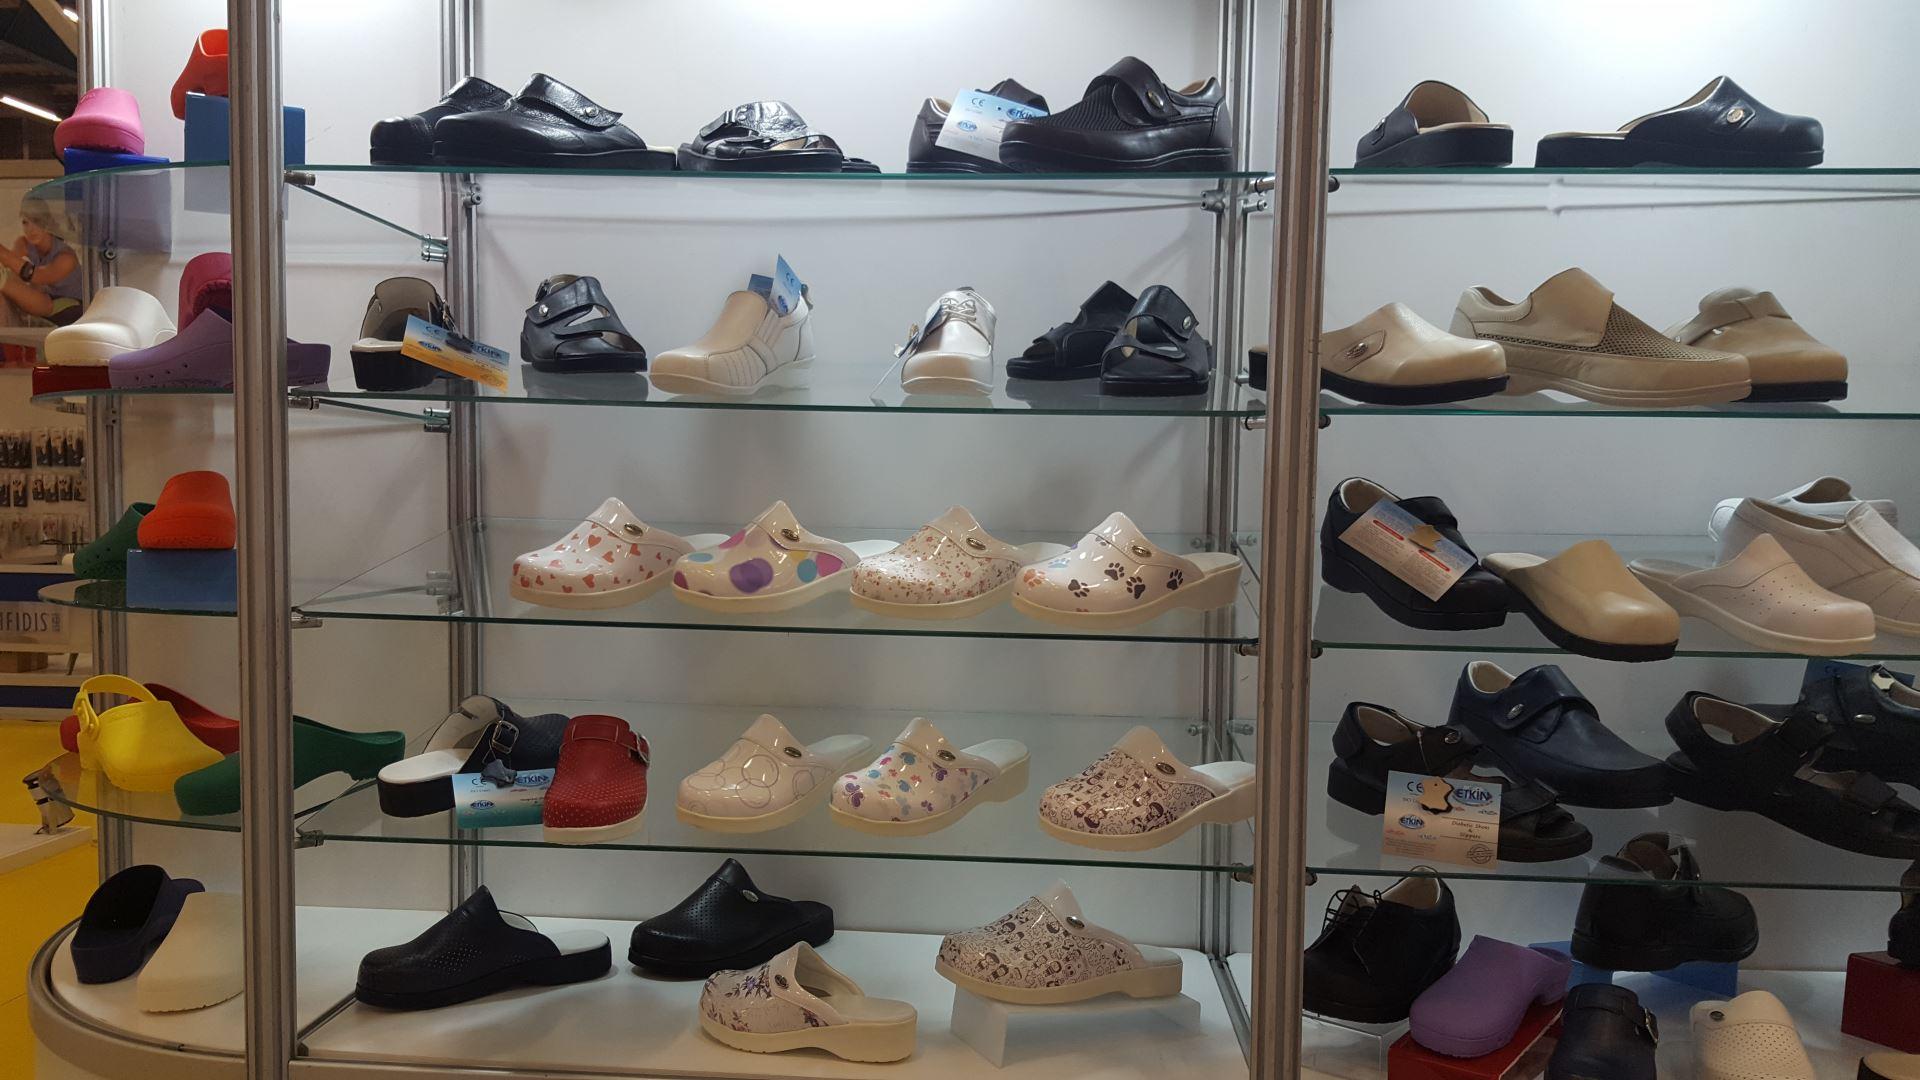 Ortopedik-terlik-medikal-ayakkabi-fuar